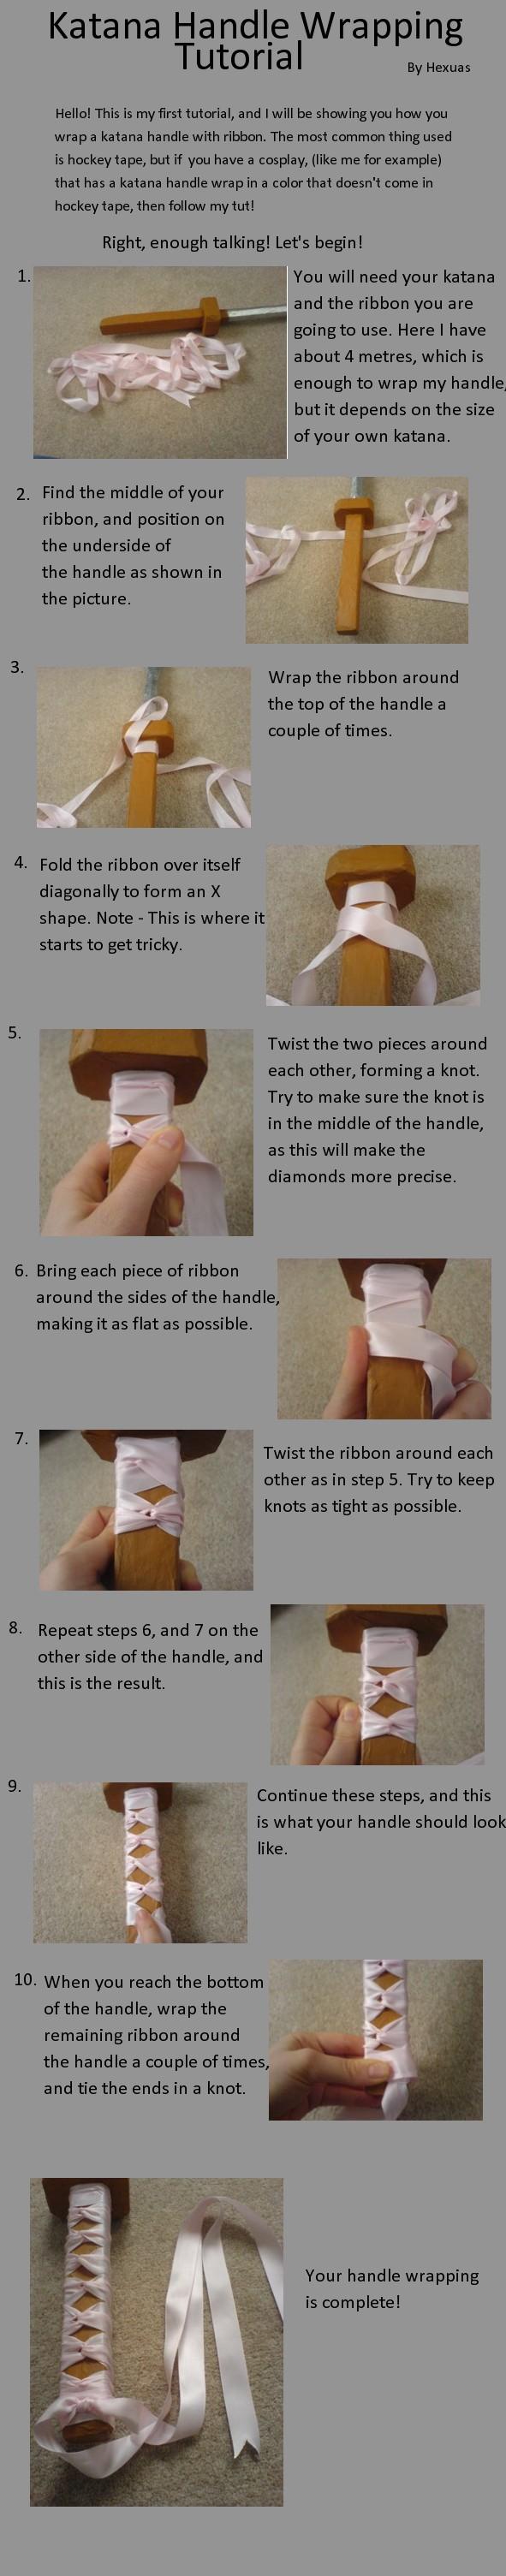 Katana Handle Wrapping Tut